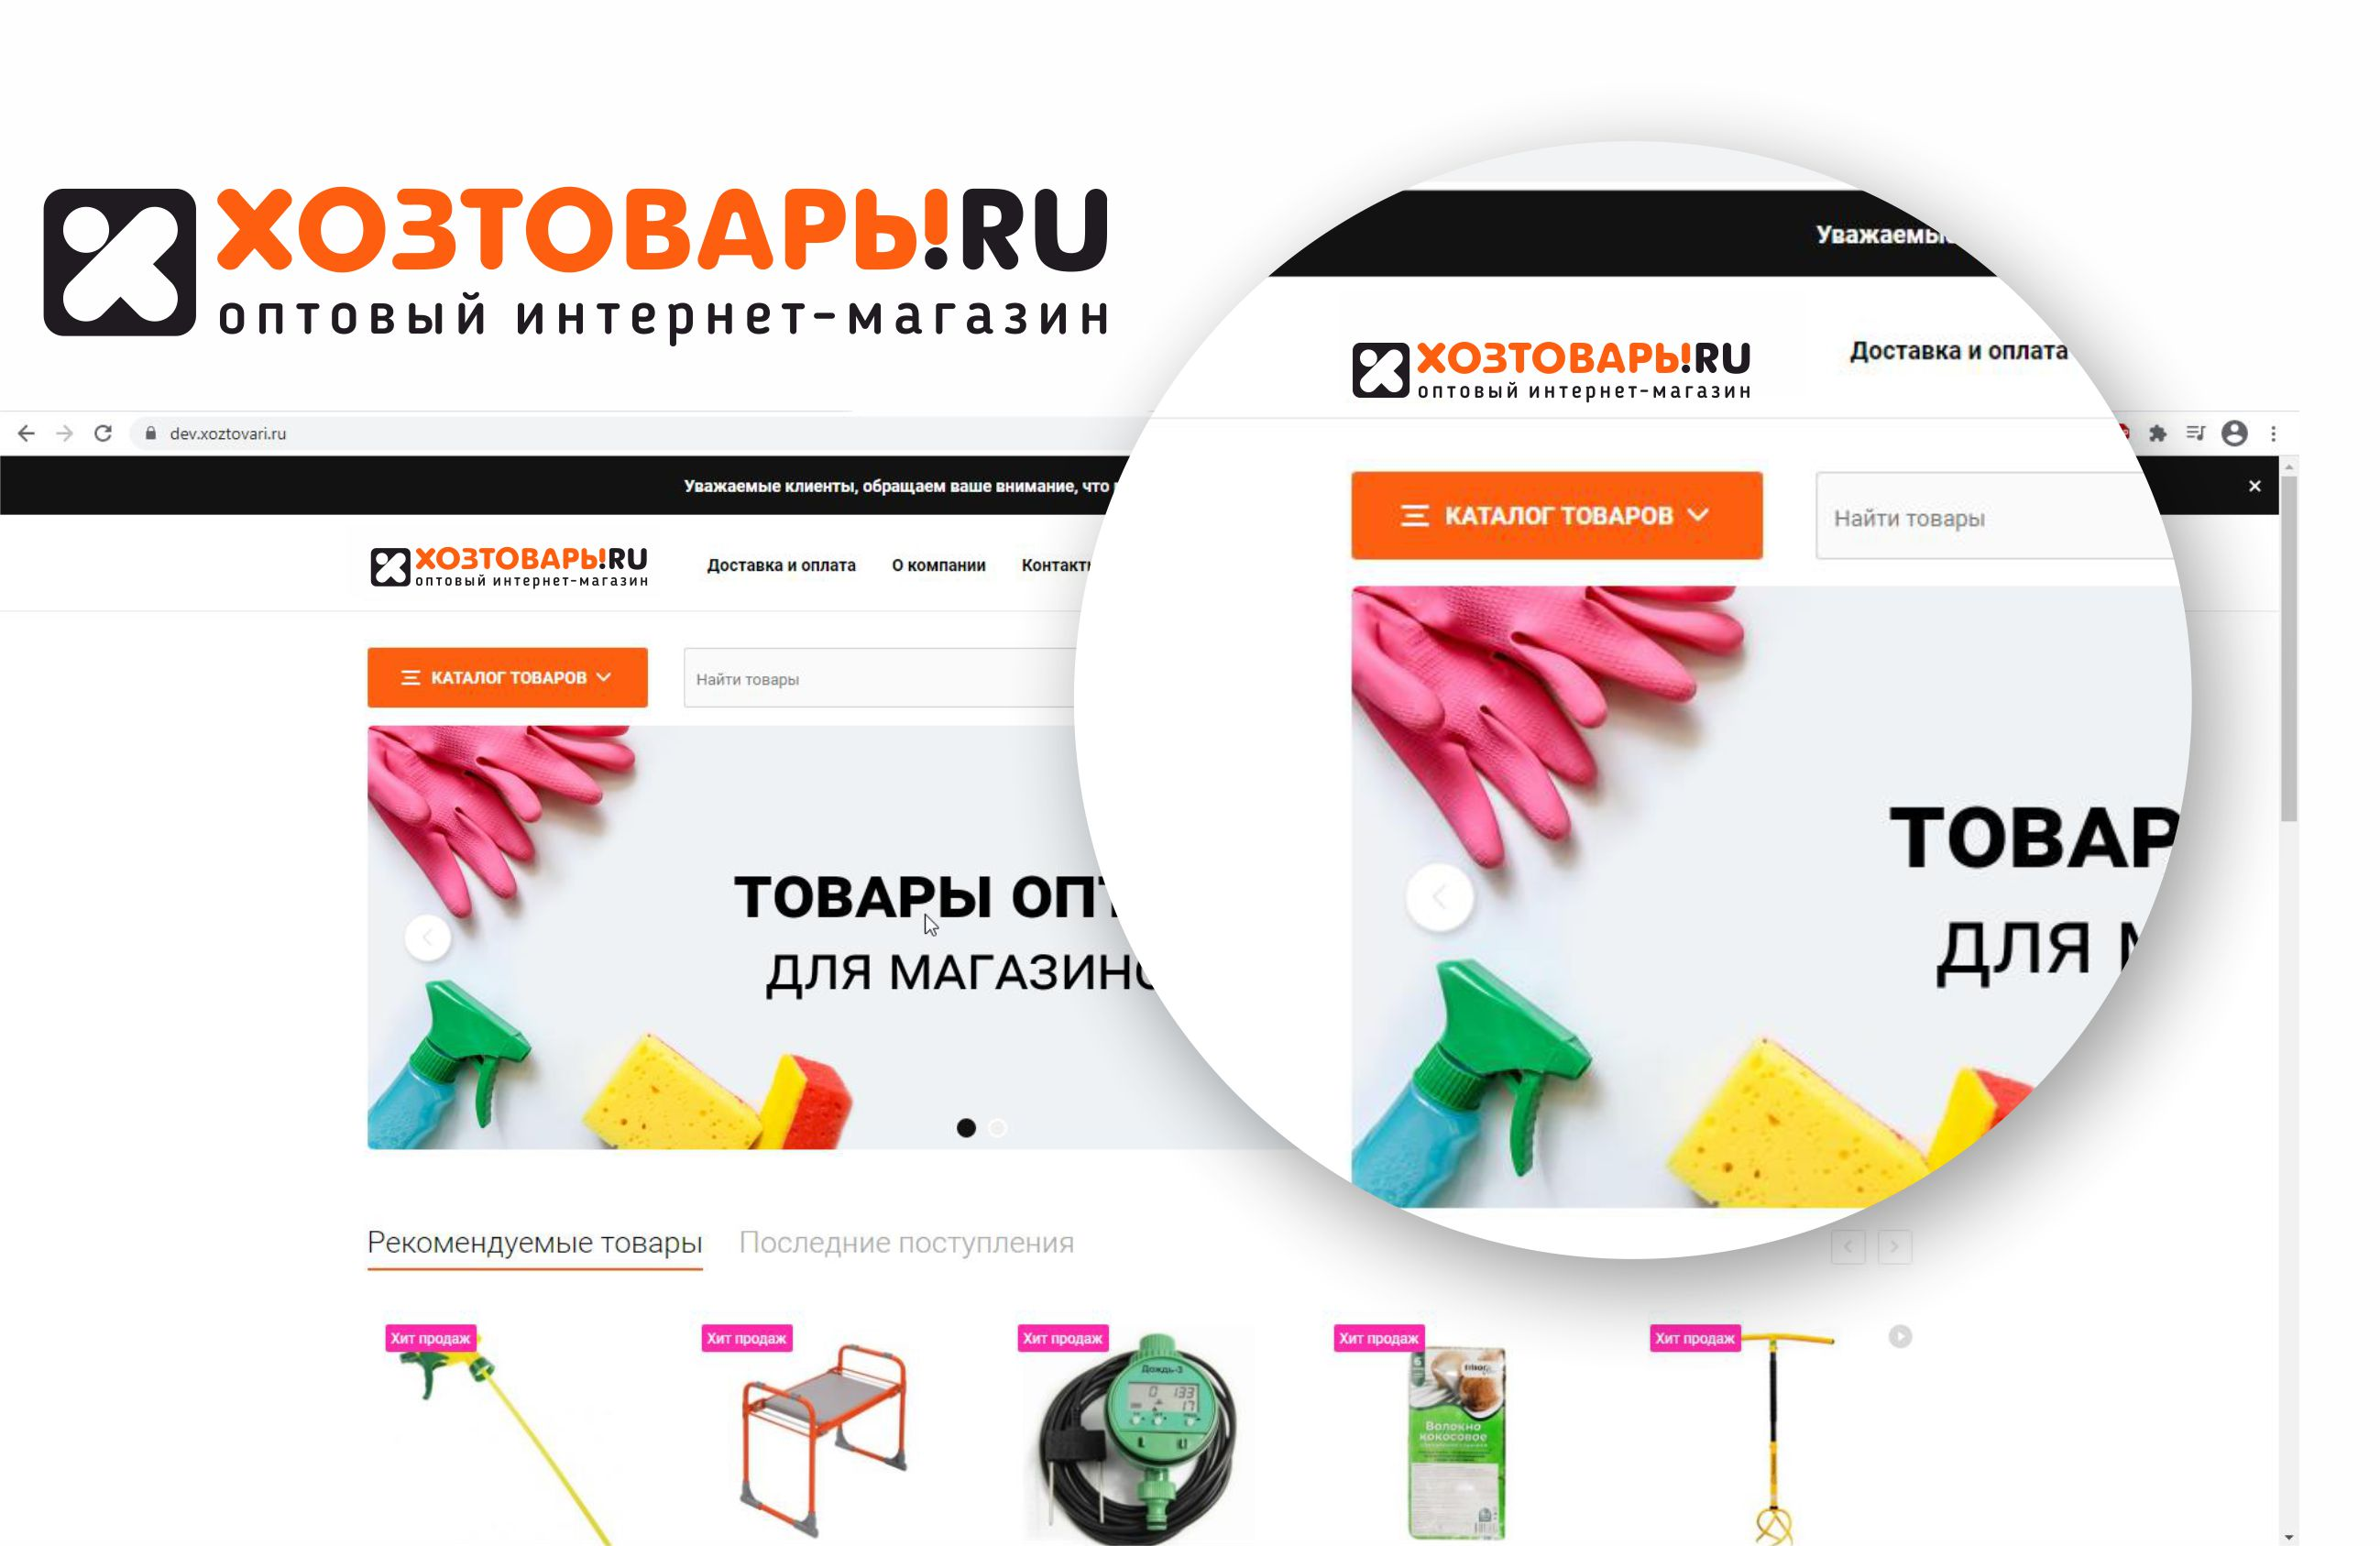 Разработка логотипа для оптового интернет-магазина «Хозтовары.ру» фото f_954606cd6b8ef16b.jpg